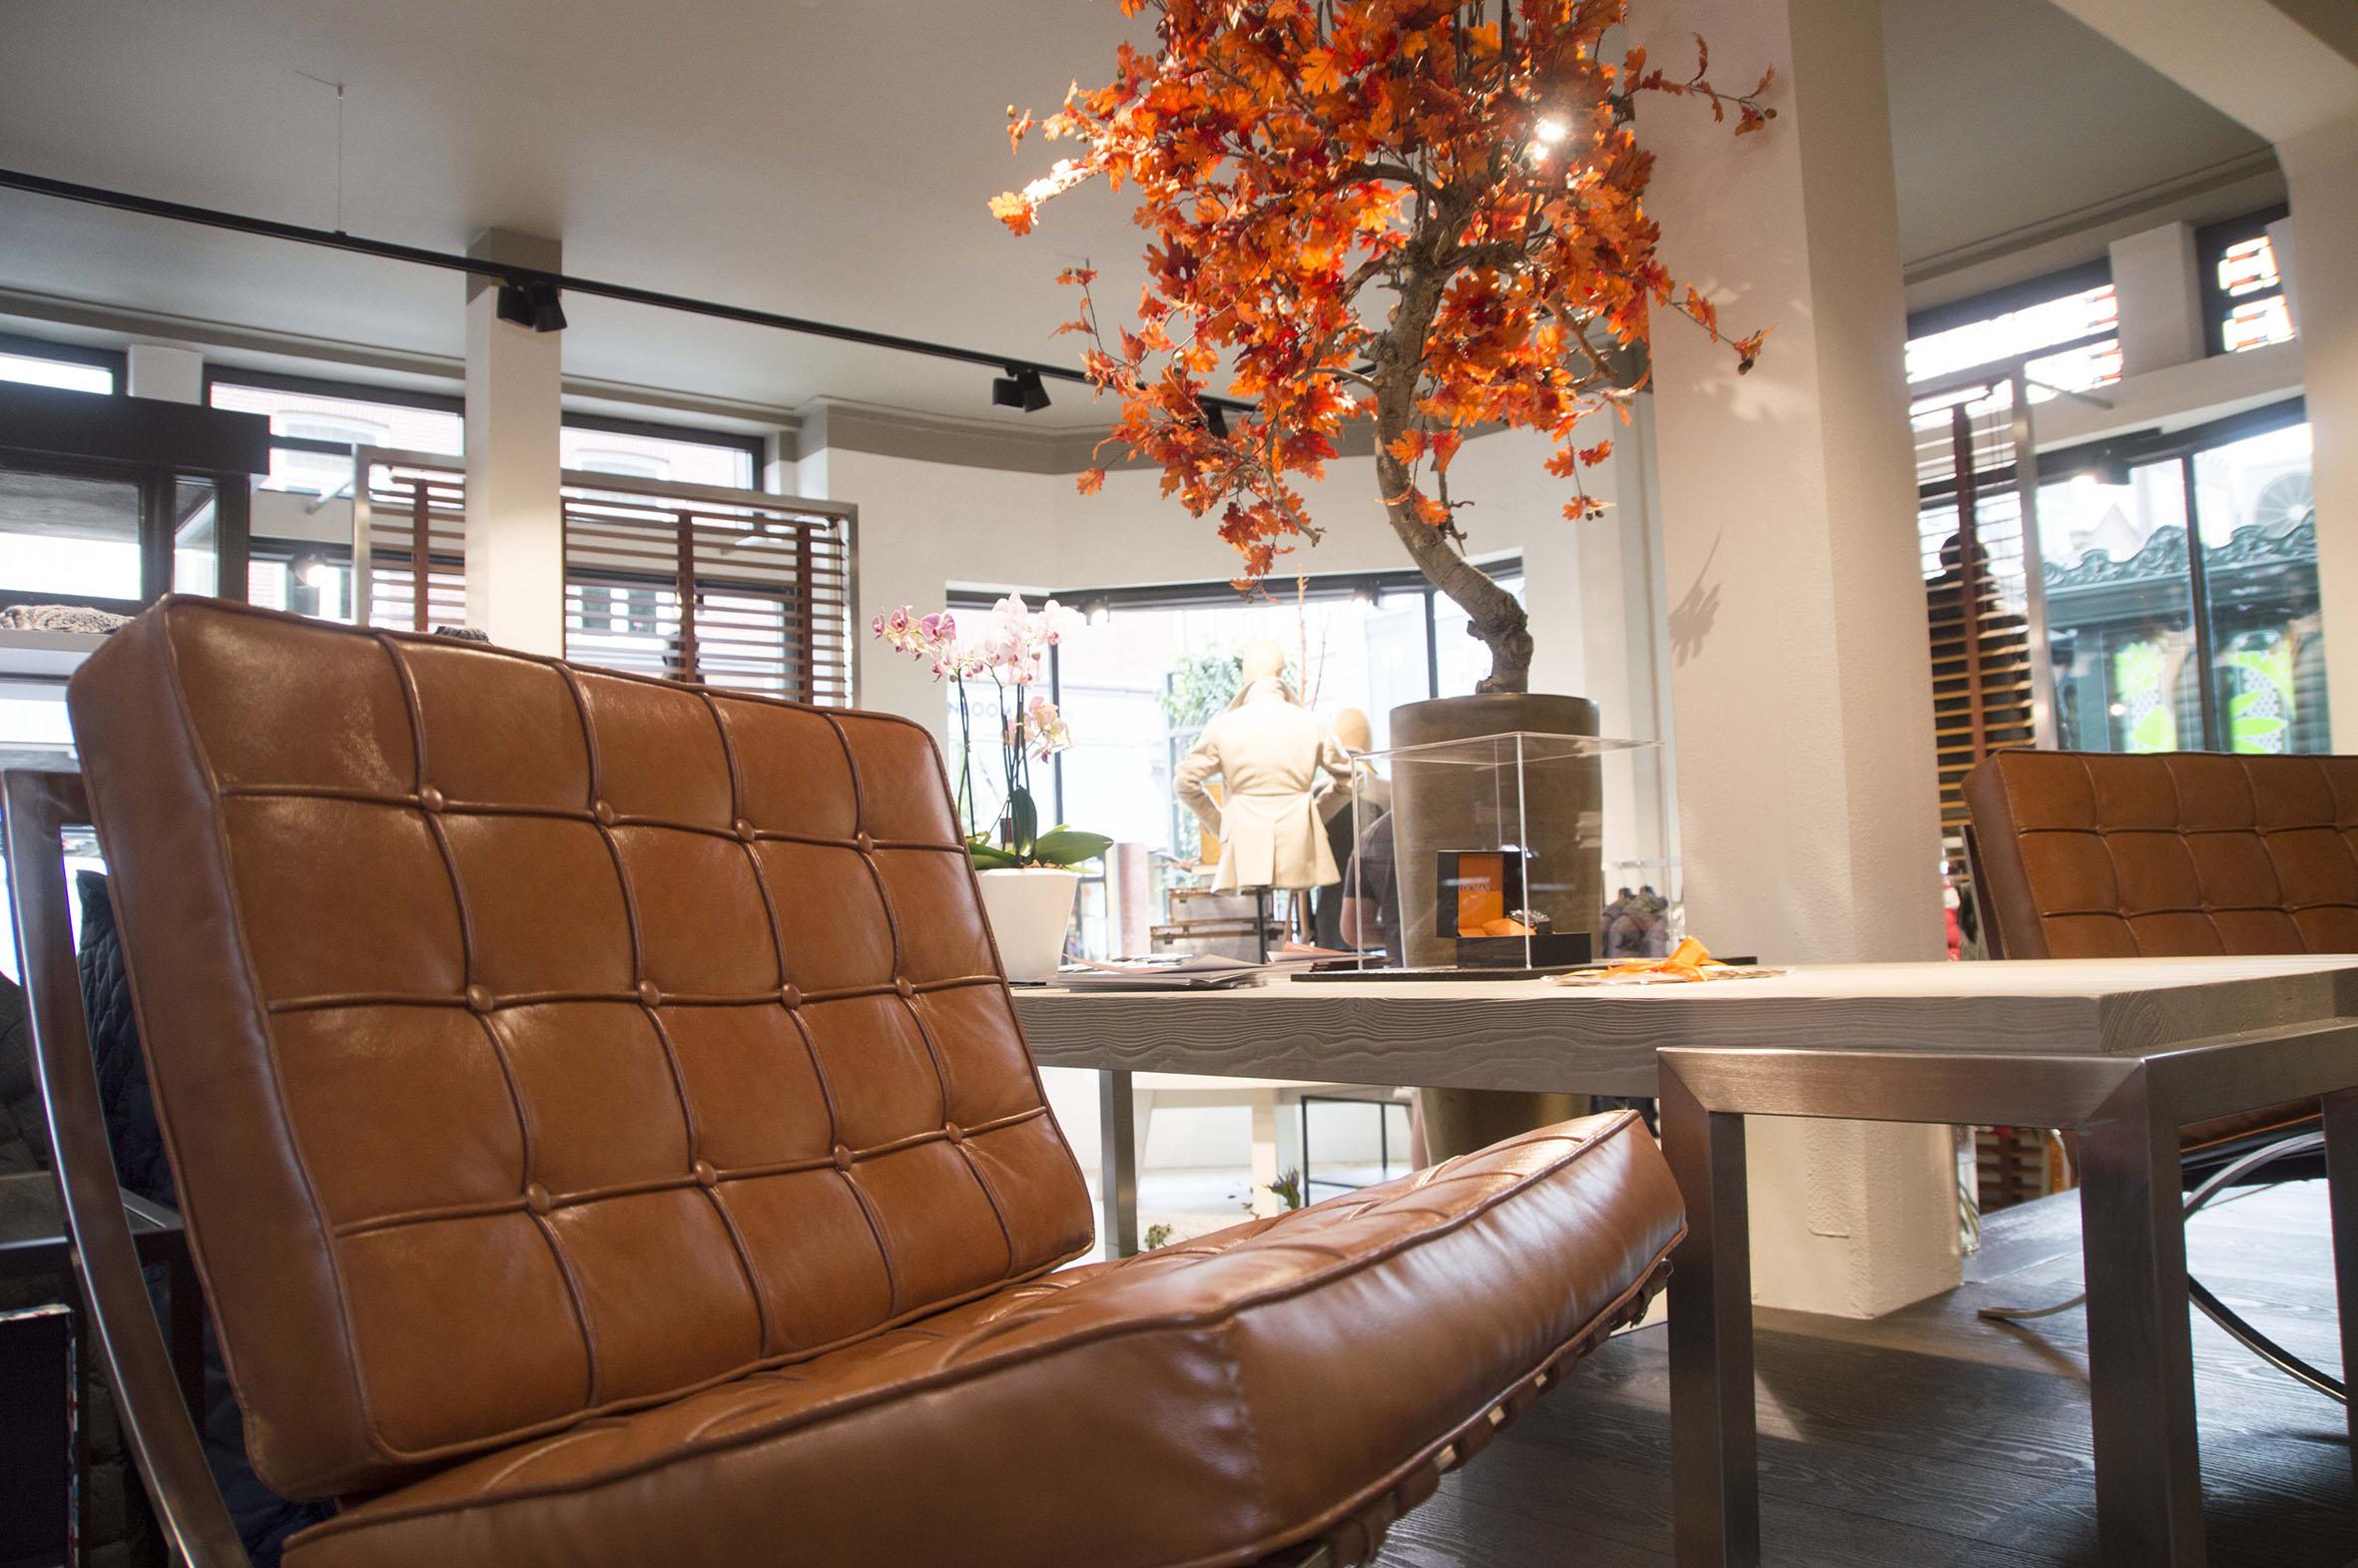 daisy-vd-heuvel-Alexander-M51-Retail-stoel